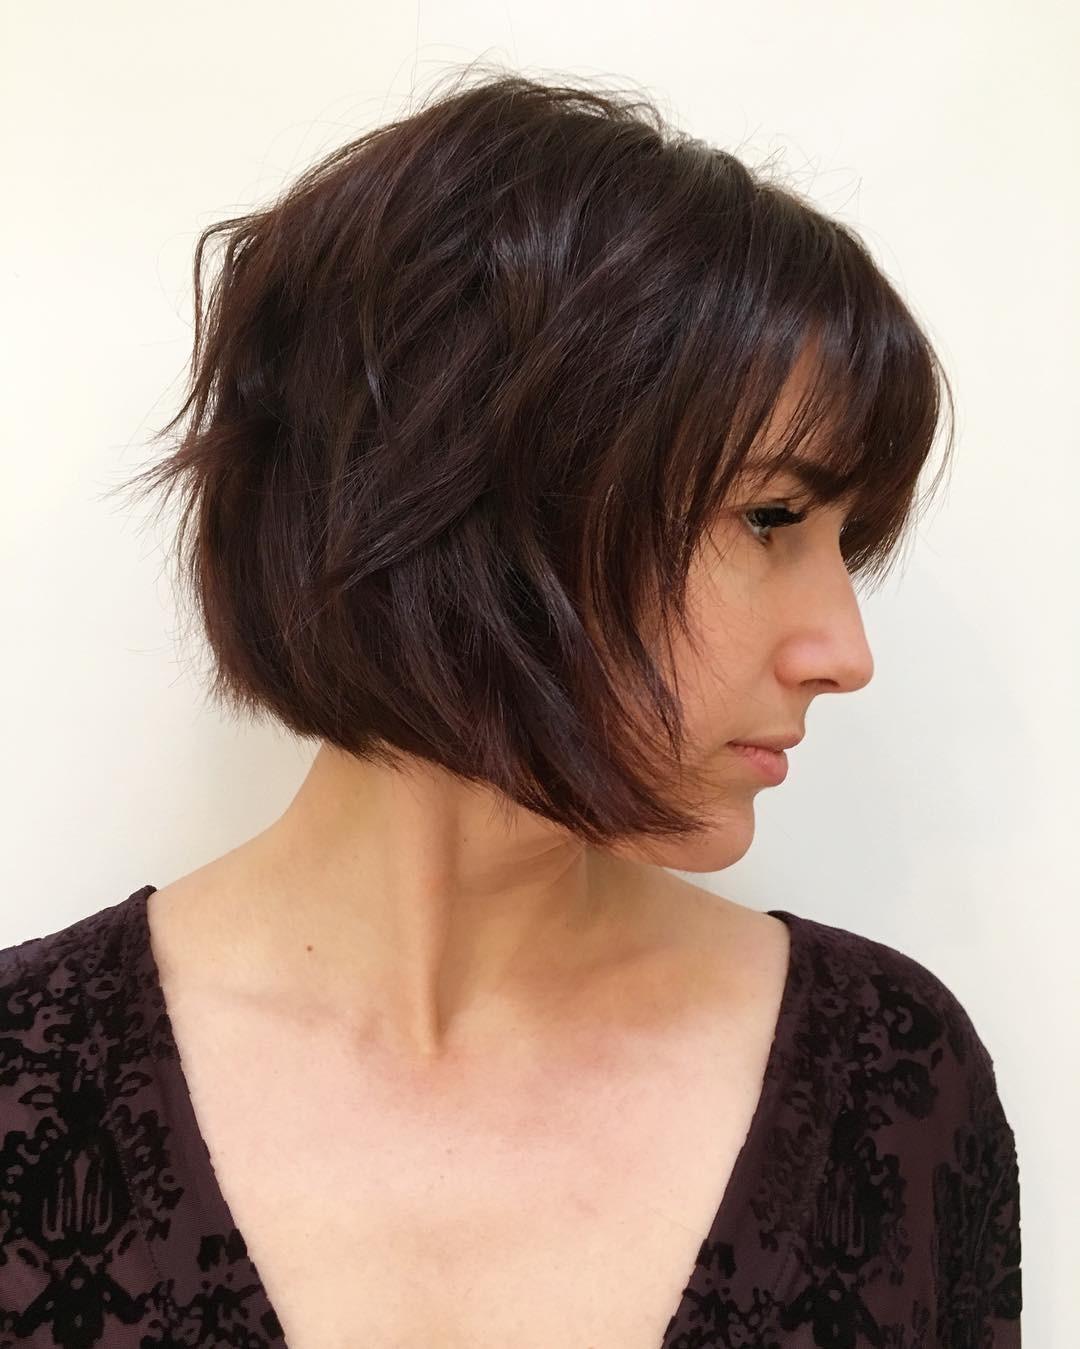 Прически со стрижкой каскад на средние волосы фото